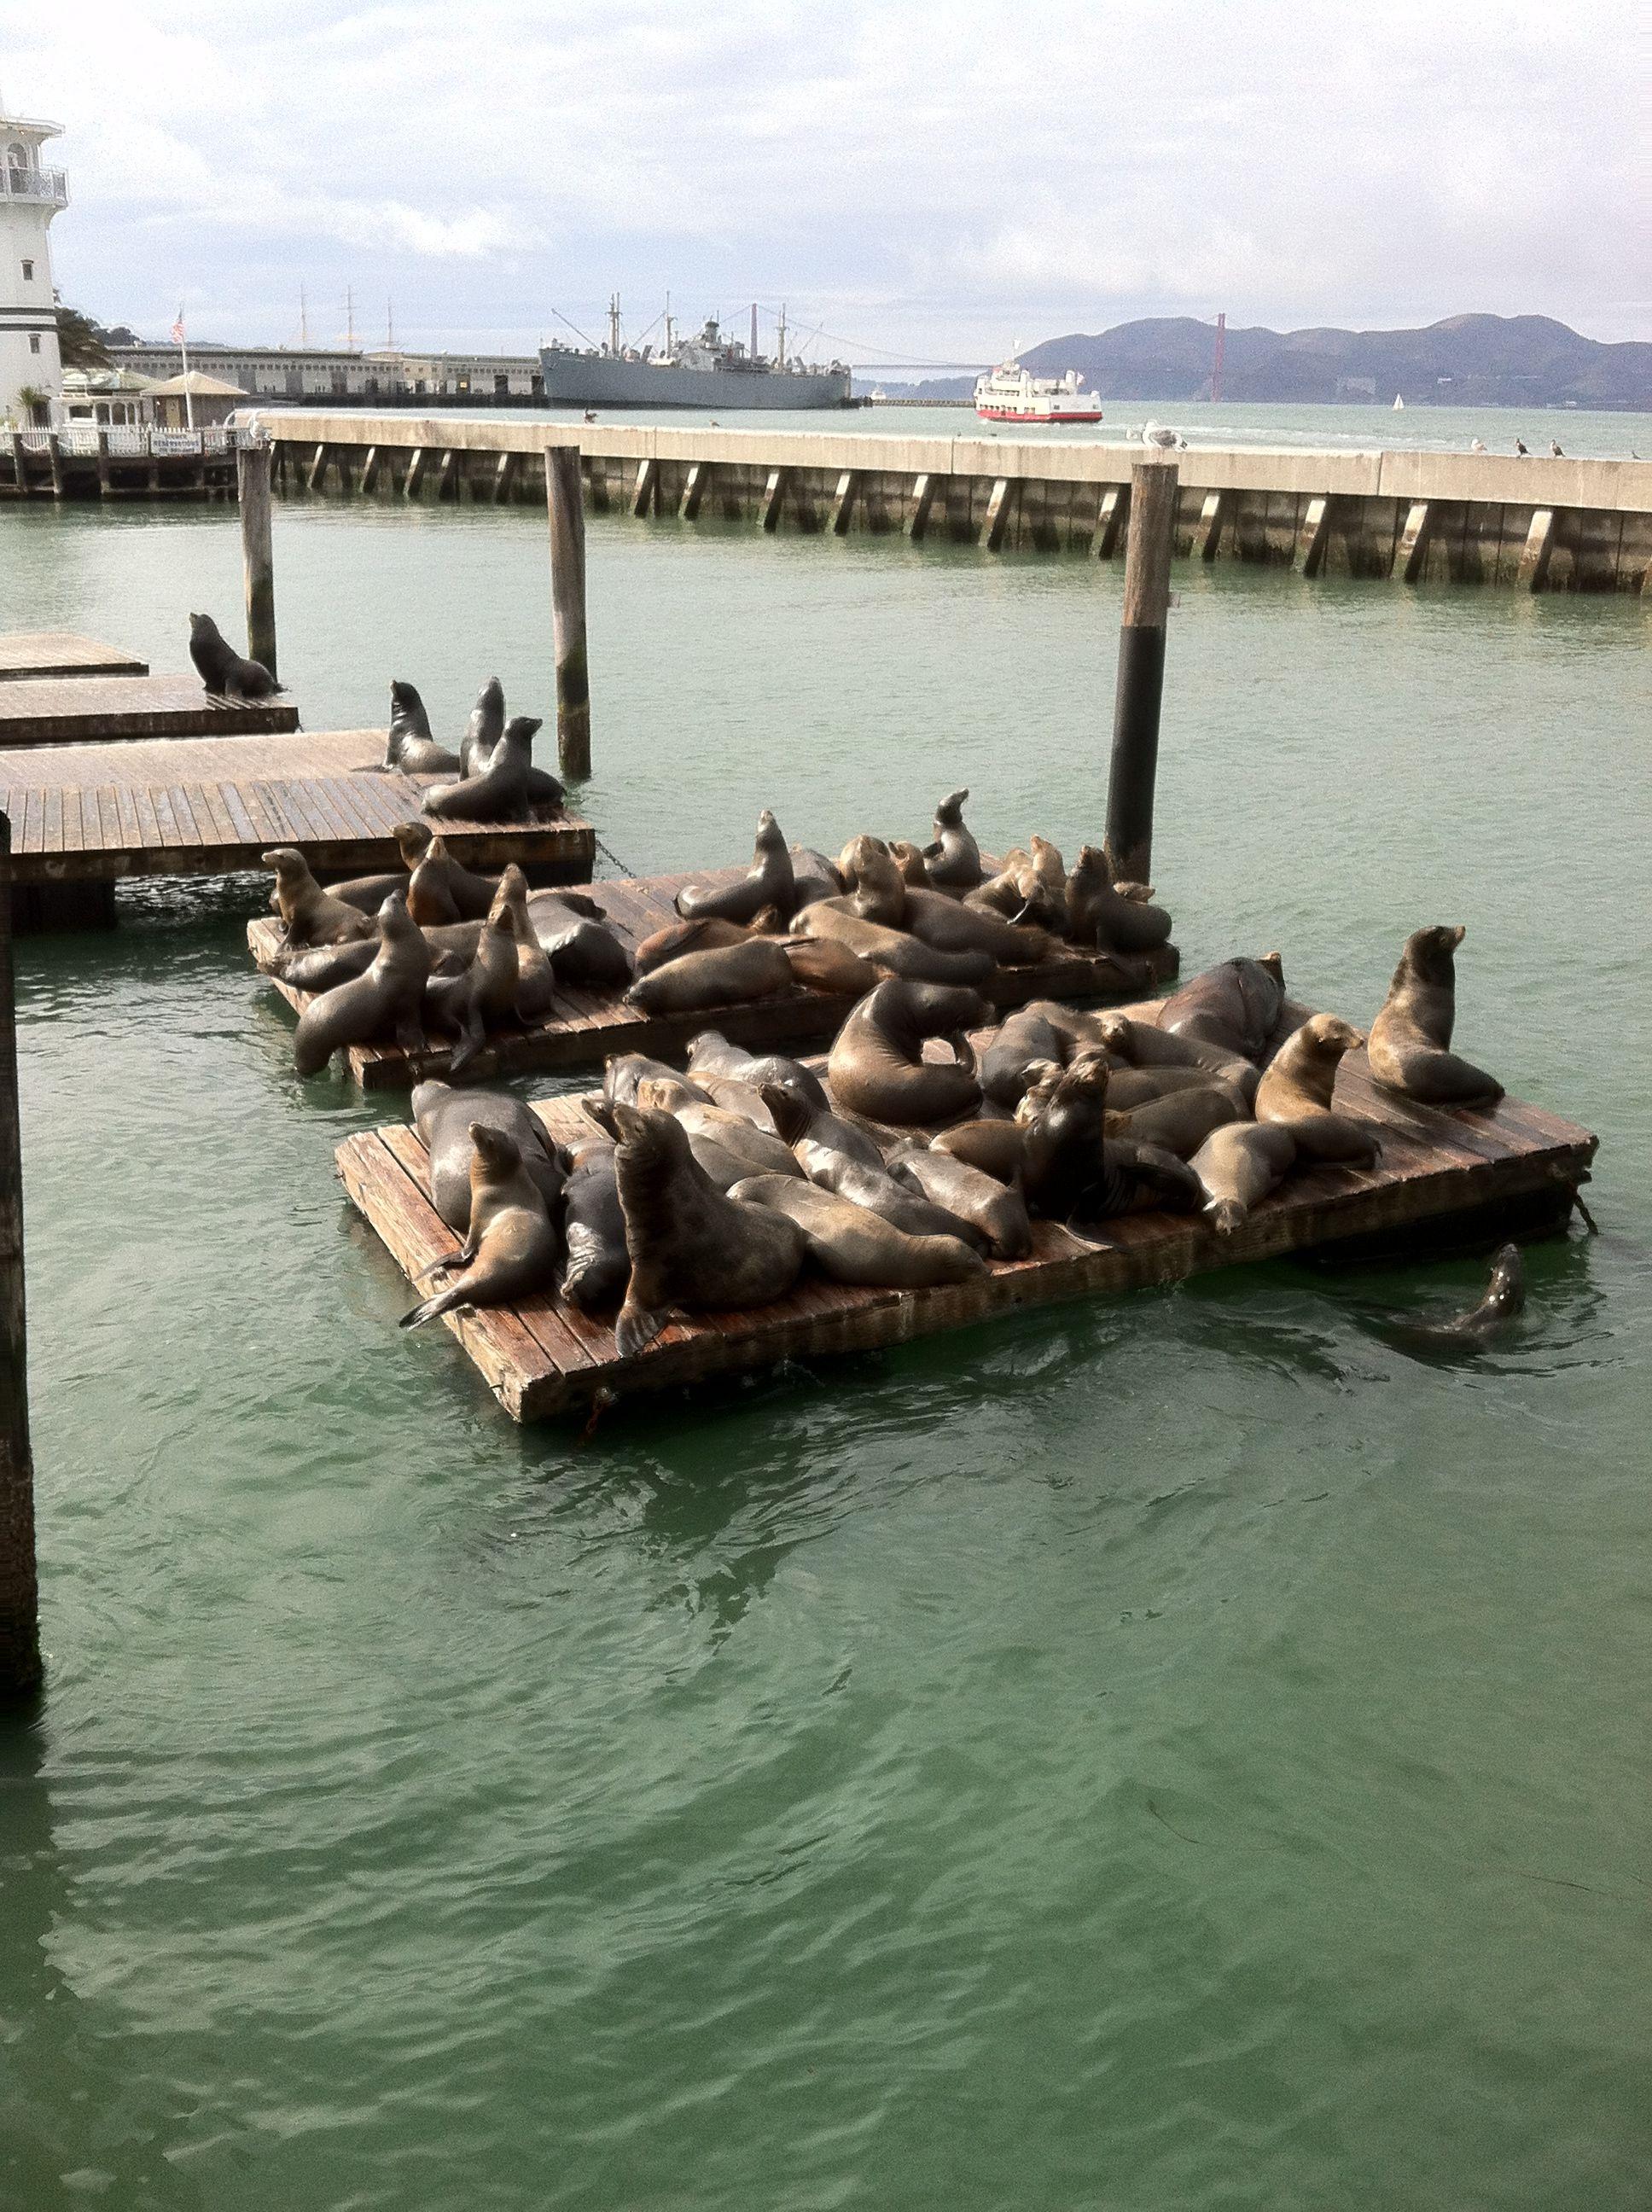 Www Aaa Com Redirect Fishermans Wharf San Francisco Tours Fisherman S Wharf San Francisco